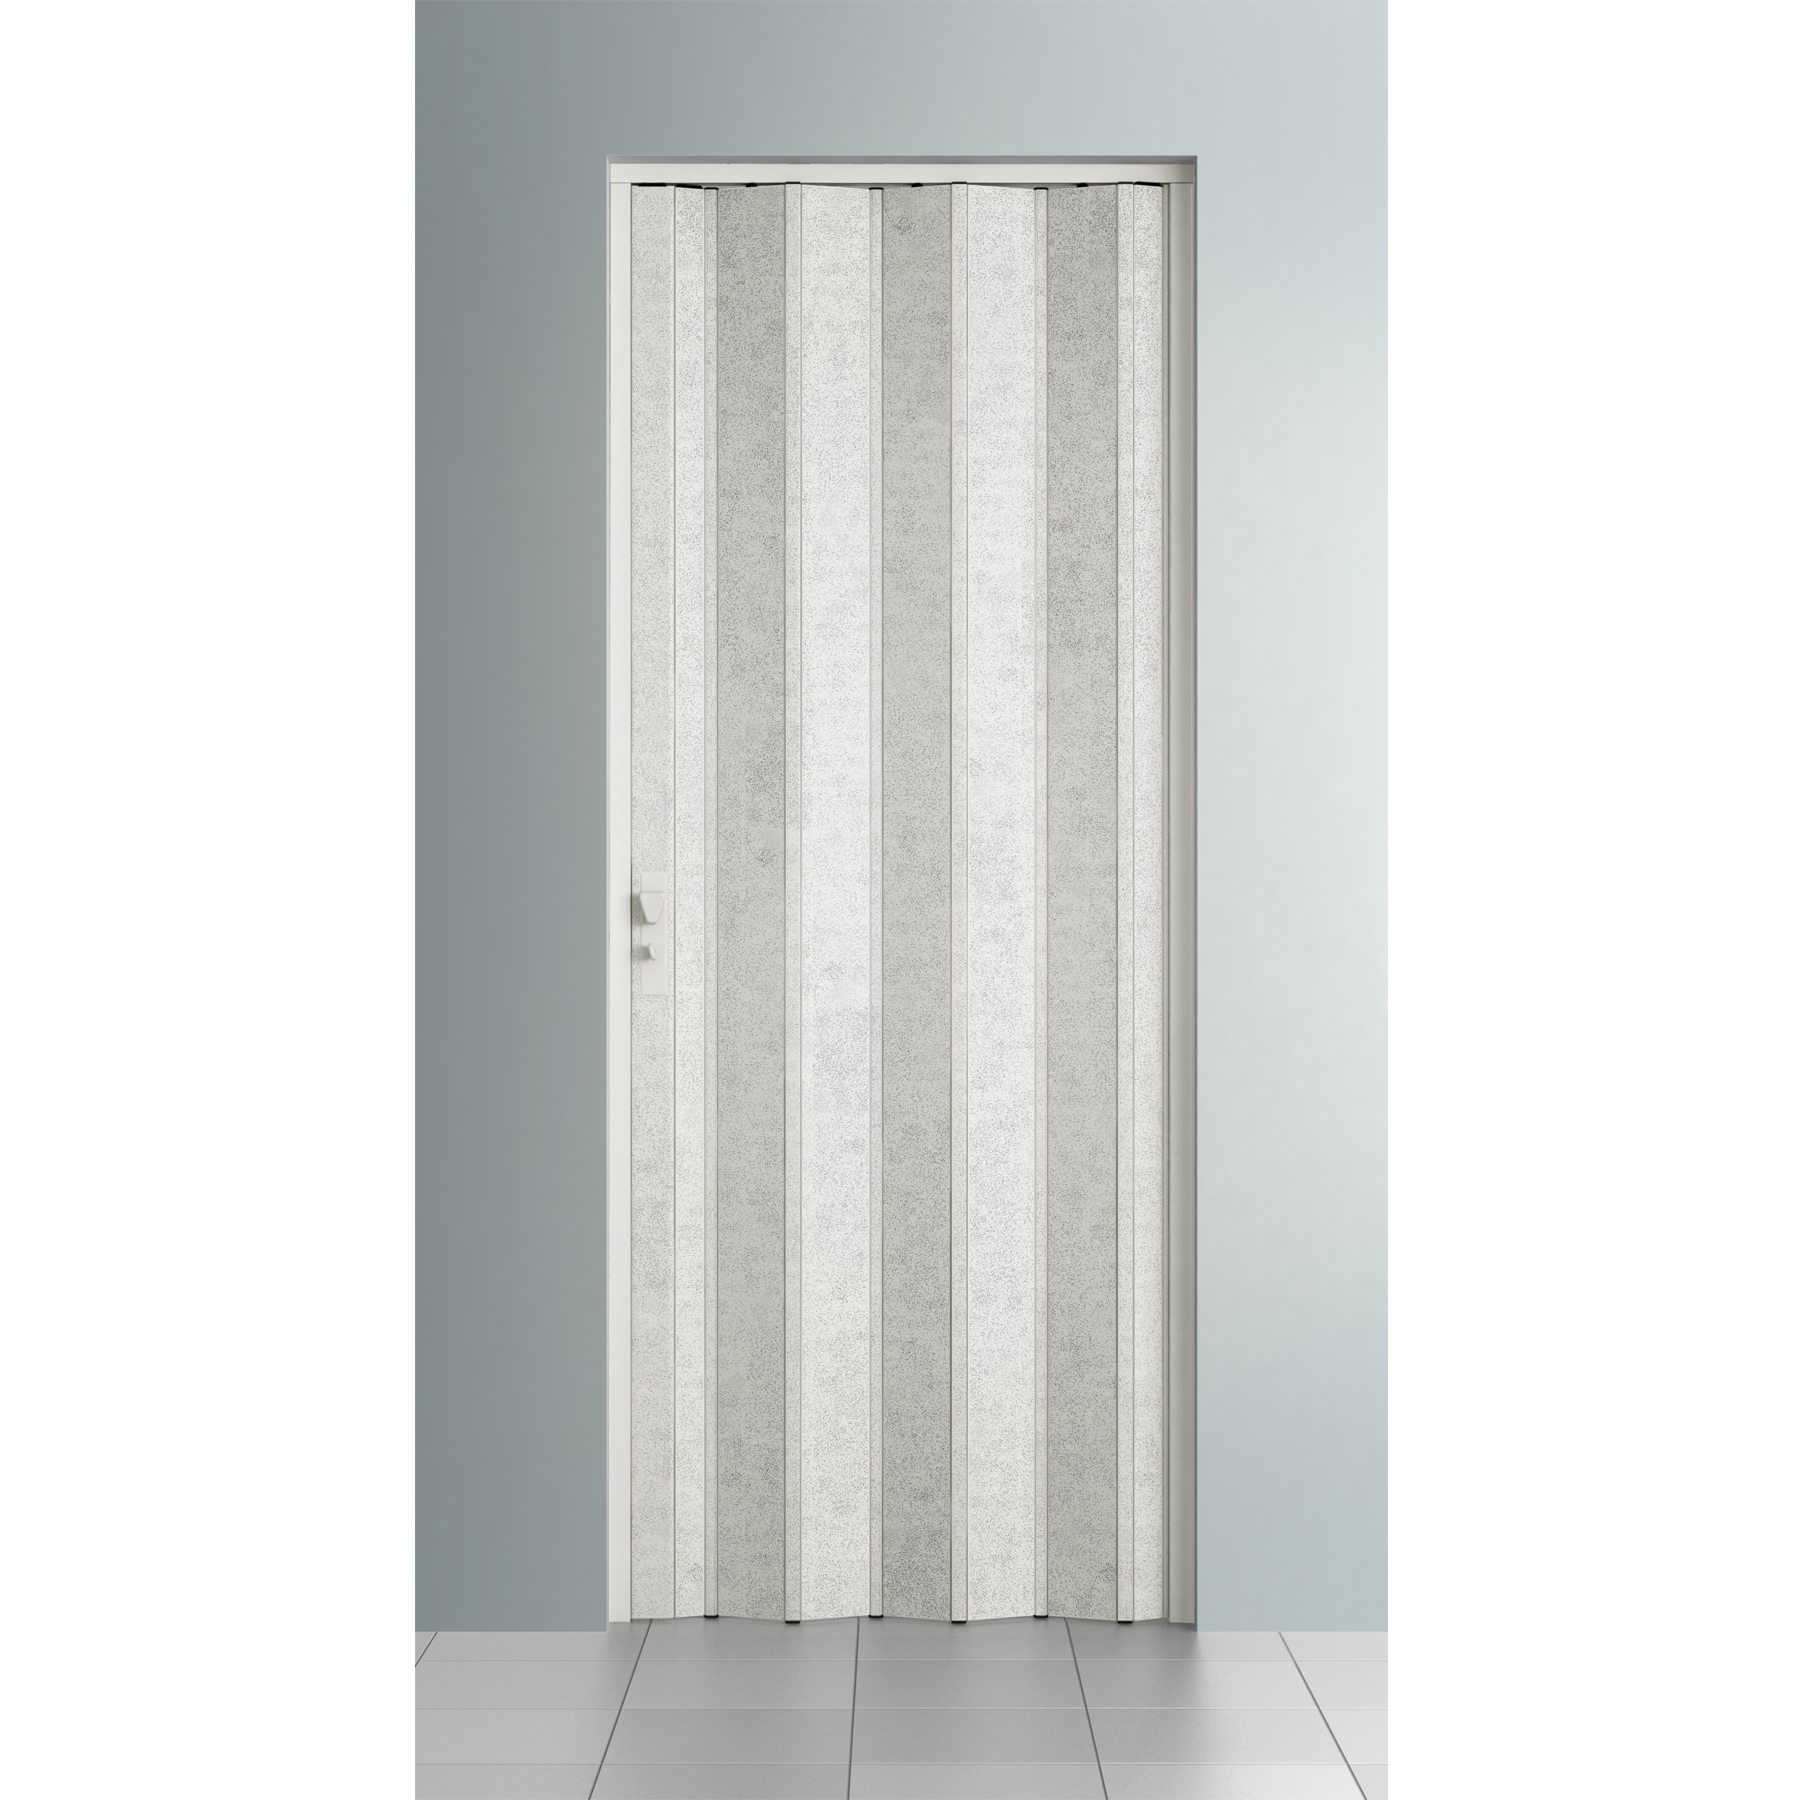 Porta sanfonada lisa pl stico pvc ambos os lados 2 1x0 96m - Porta pvc leroy merlin ...